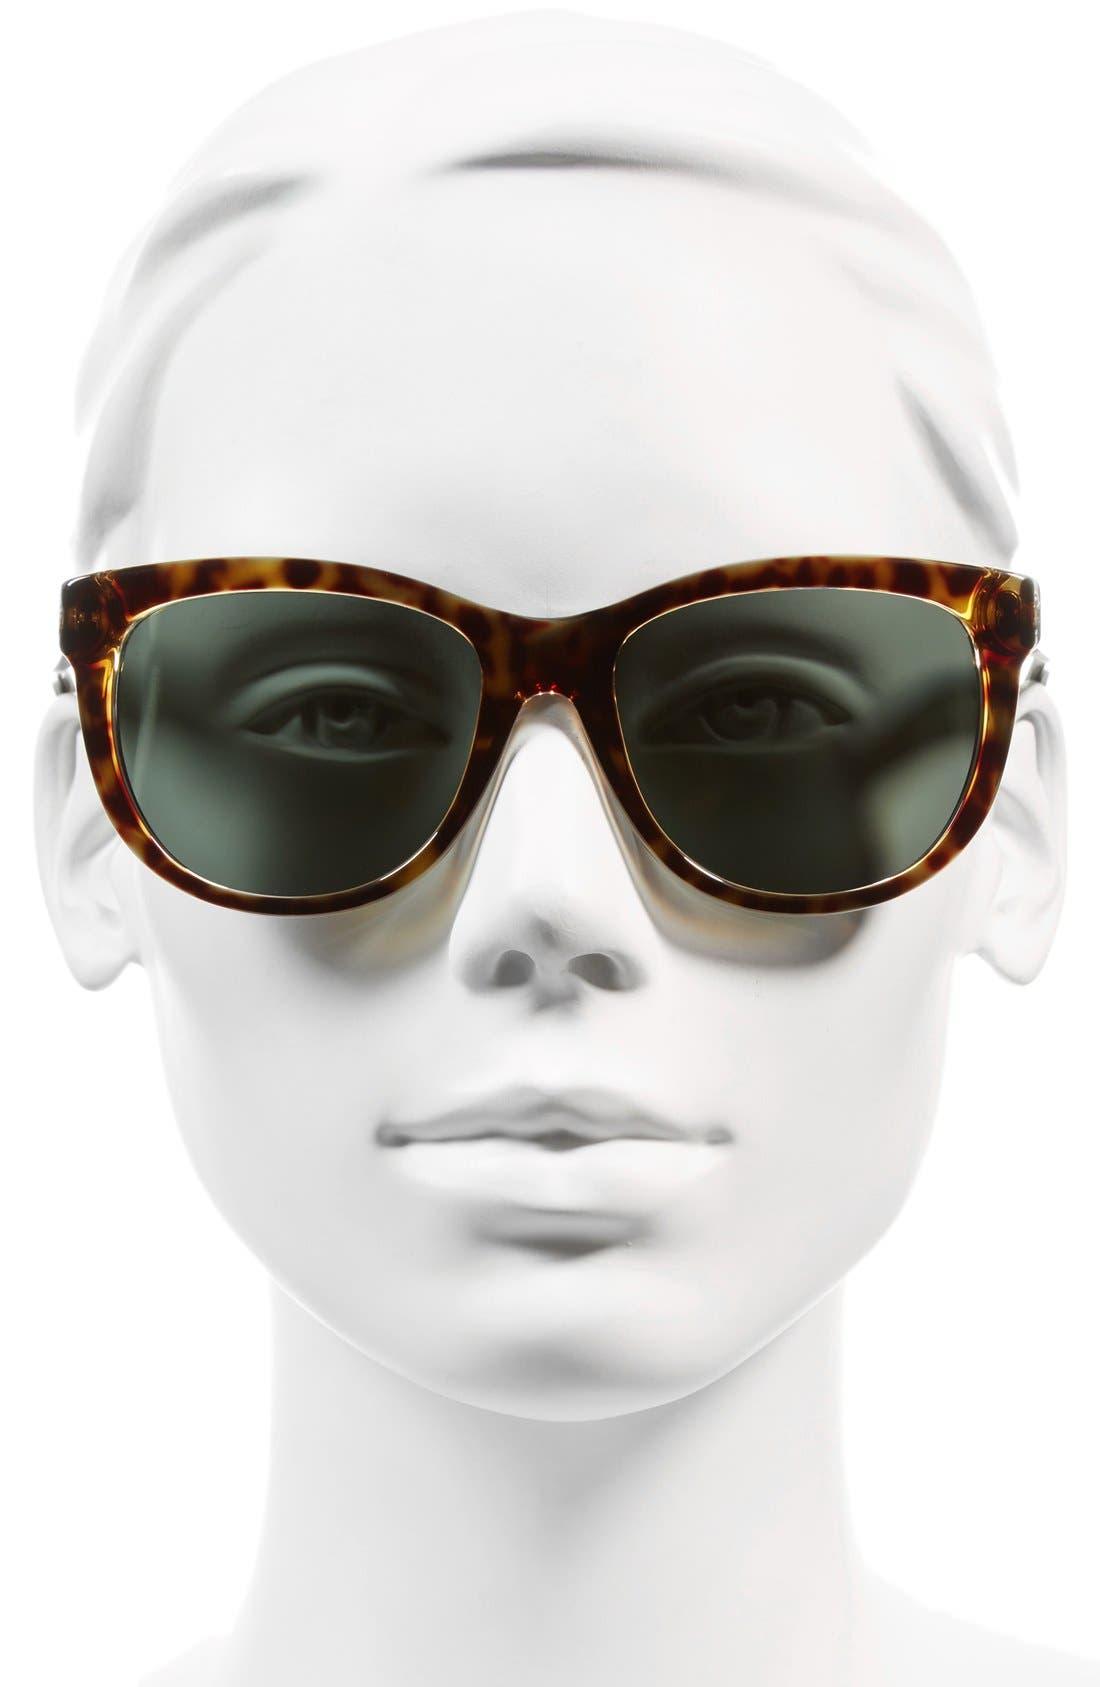 55mm Sunglasses,                             Alternate thumbnail 4, color,                             300